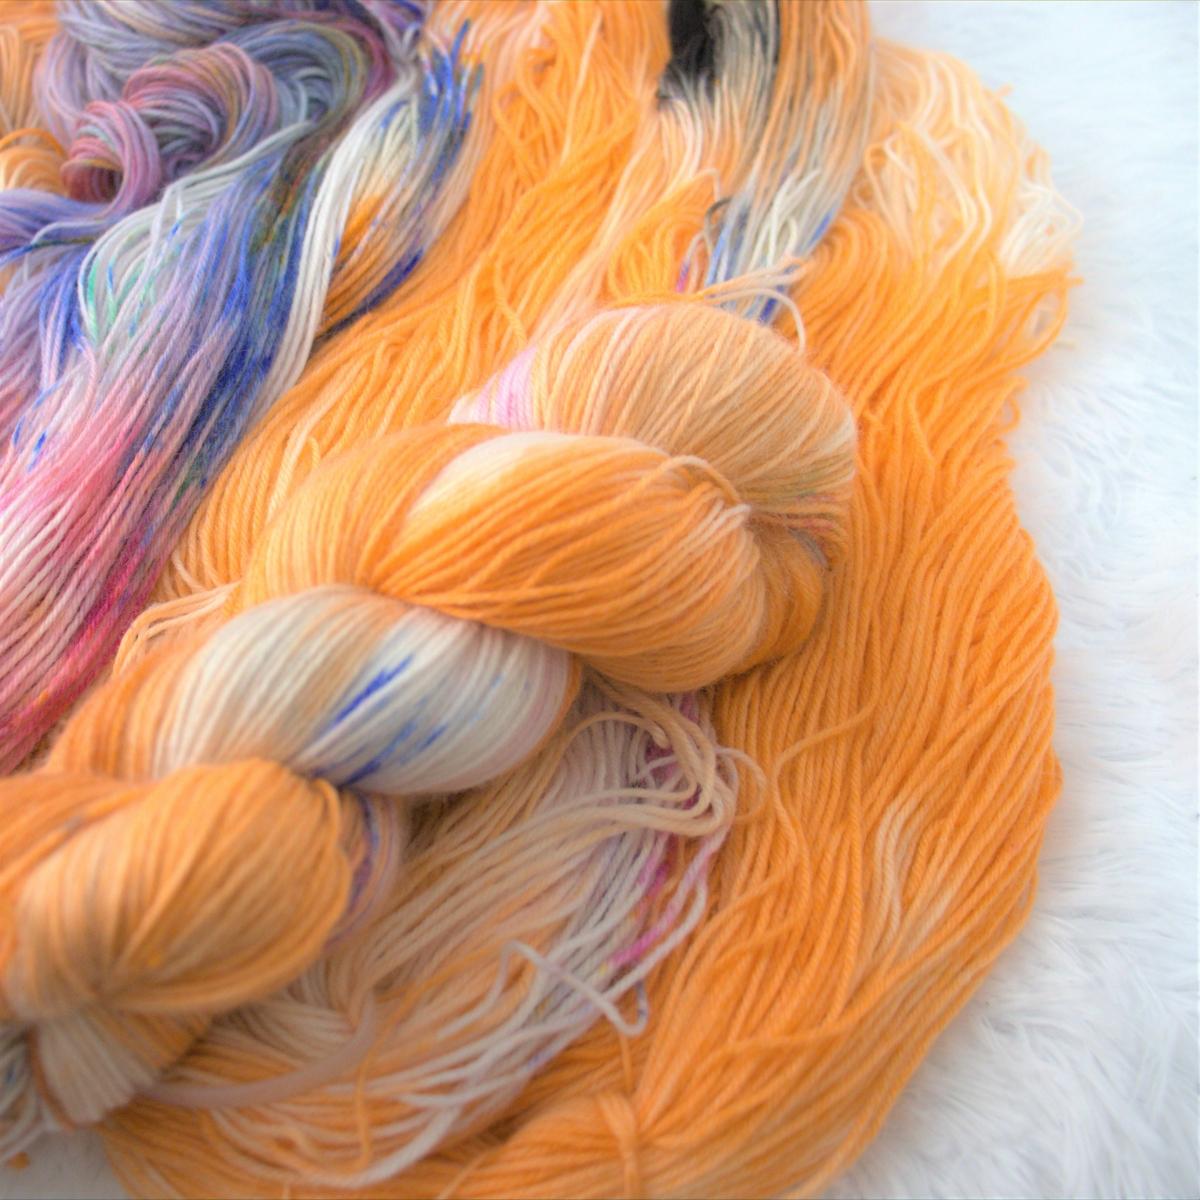 woodico.pro hand dyed yarn 045 1 1200x1200 - Hand dyed yarn / 045